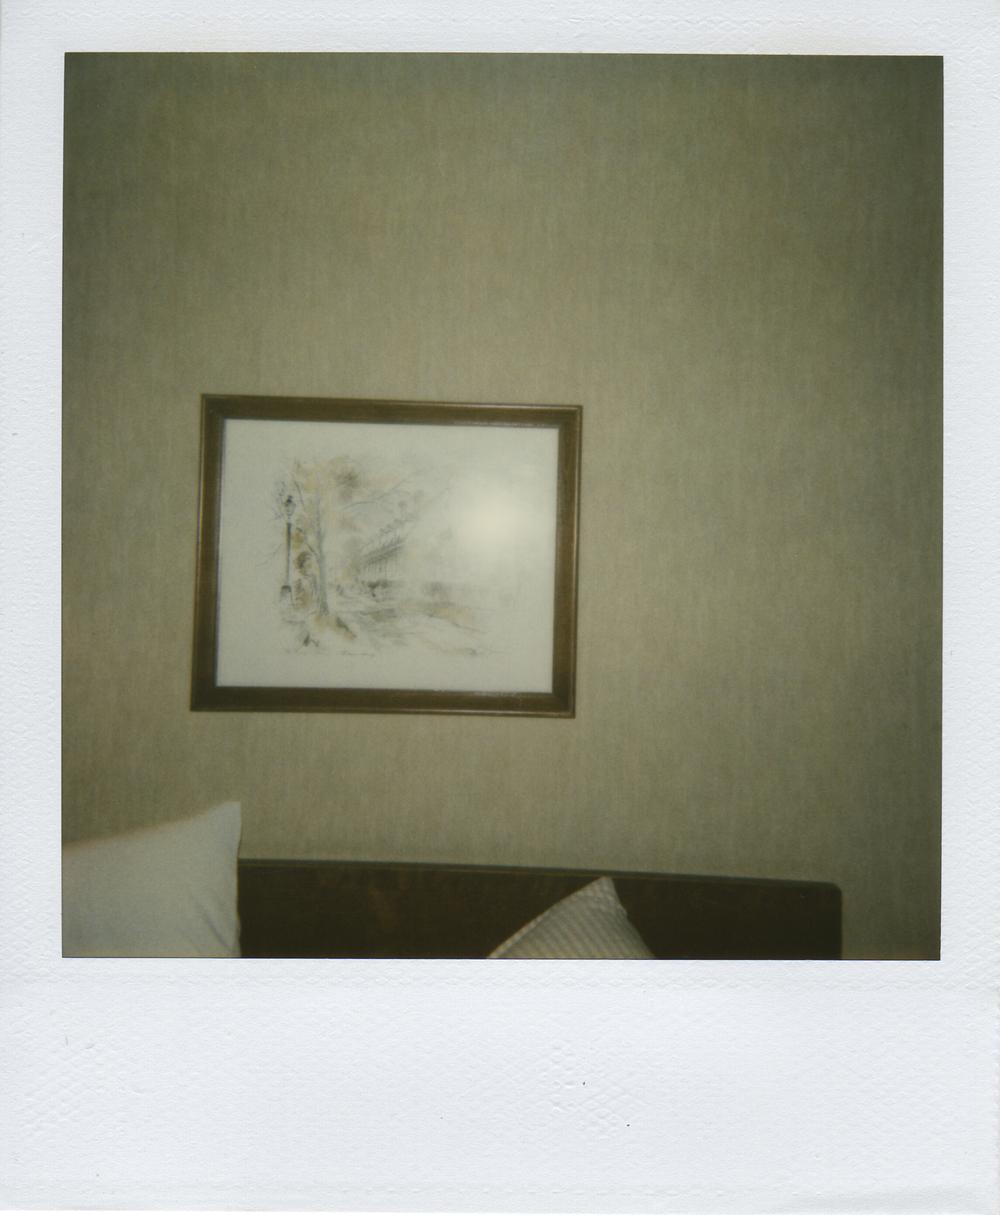 jlaurence-polaroid-036.jpg